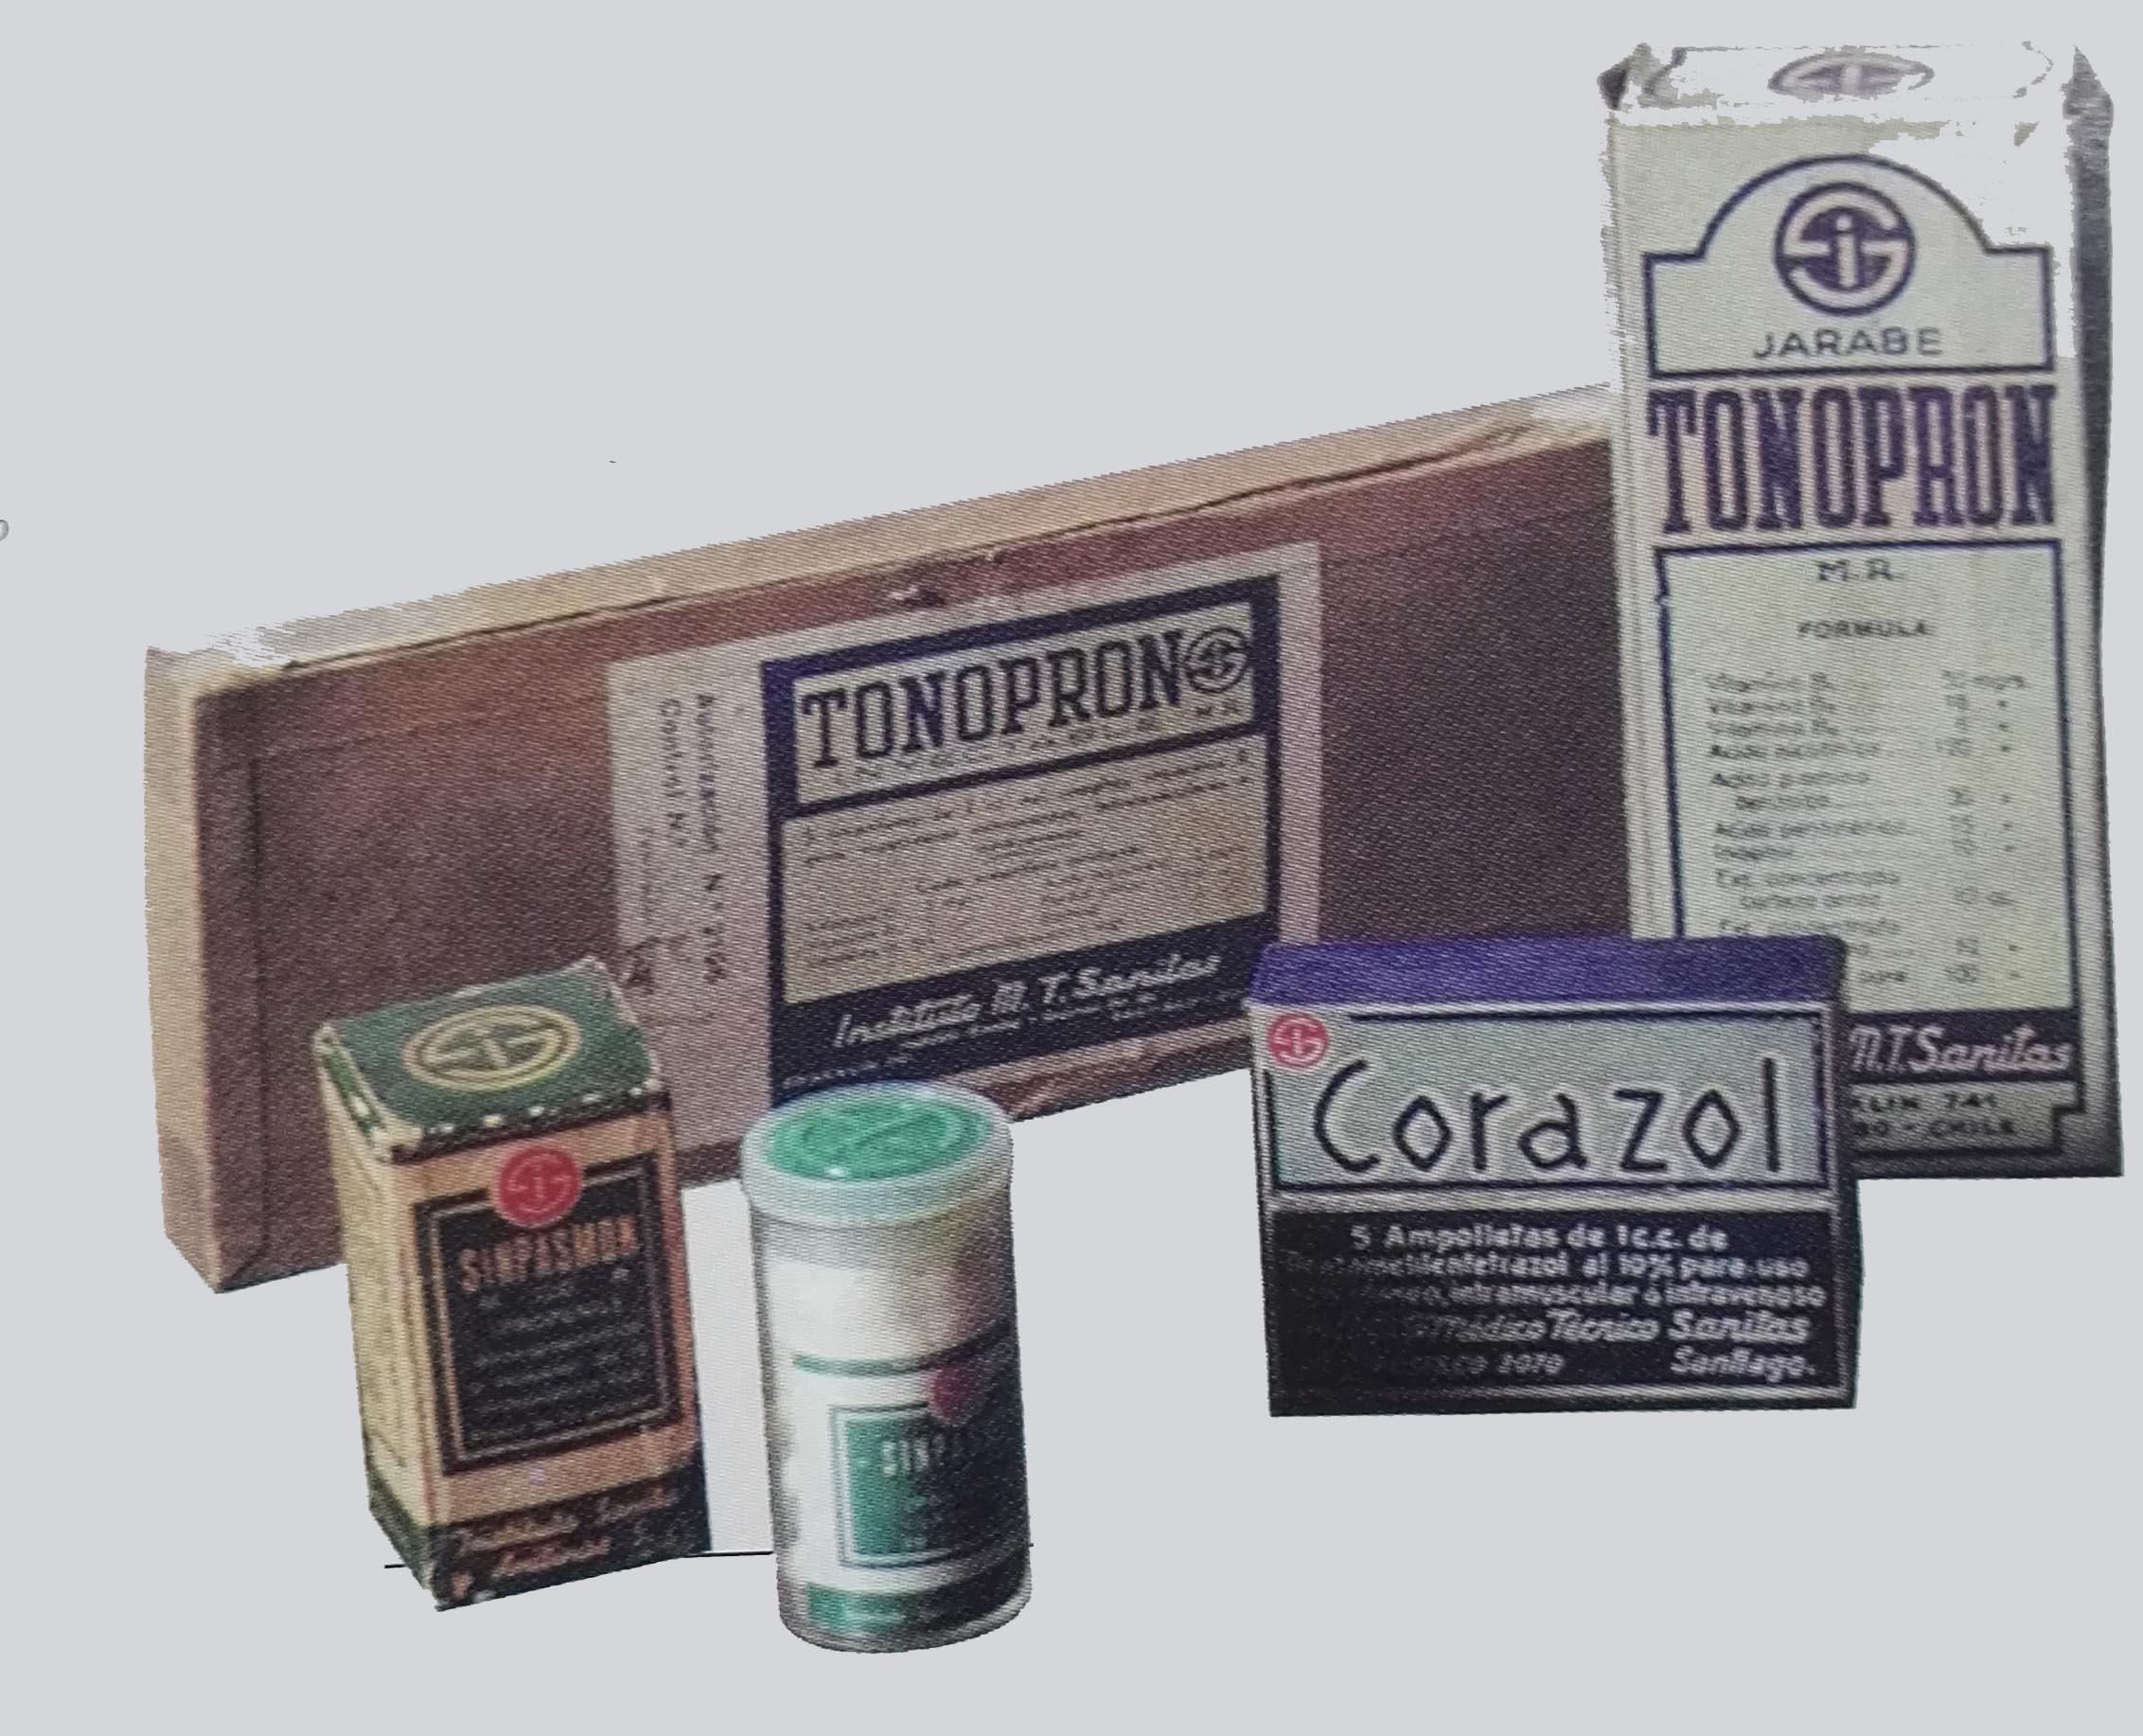 Tonopron